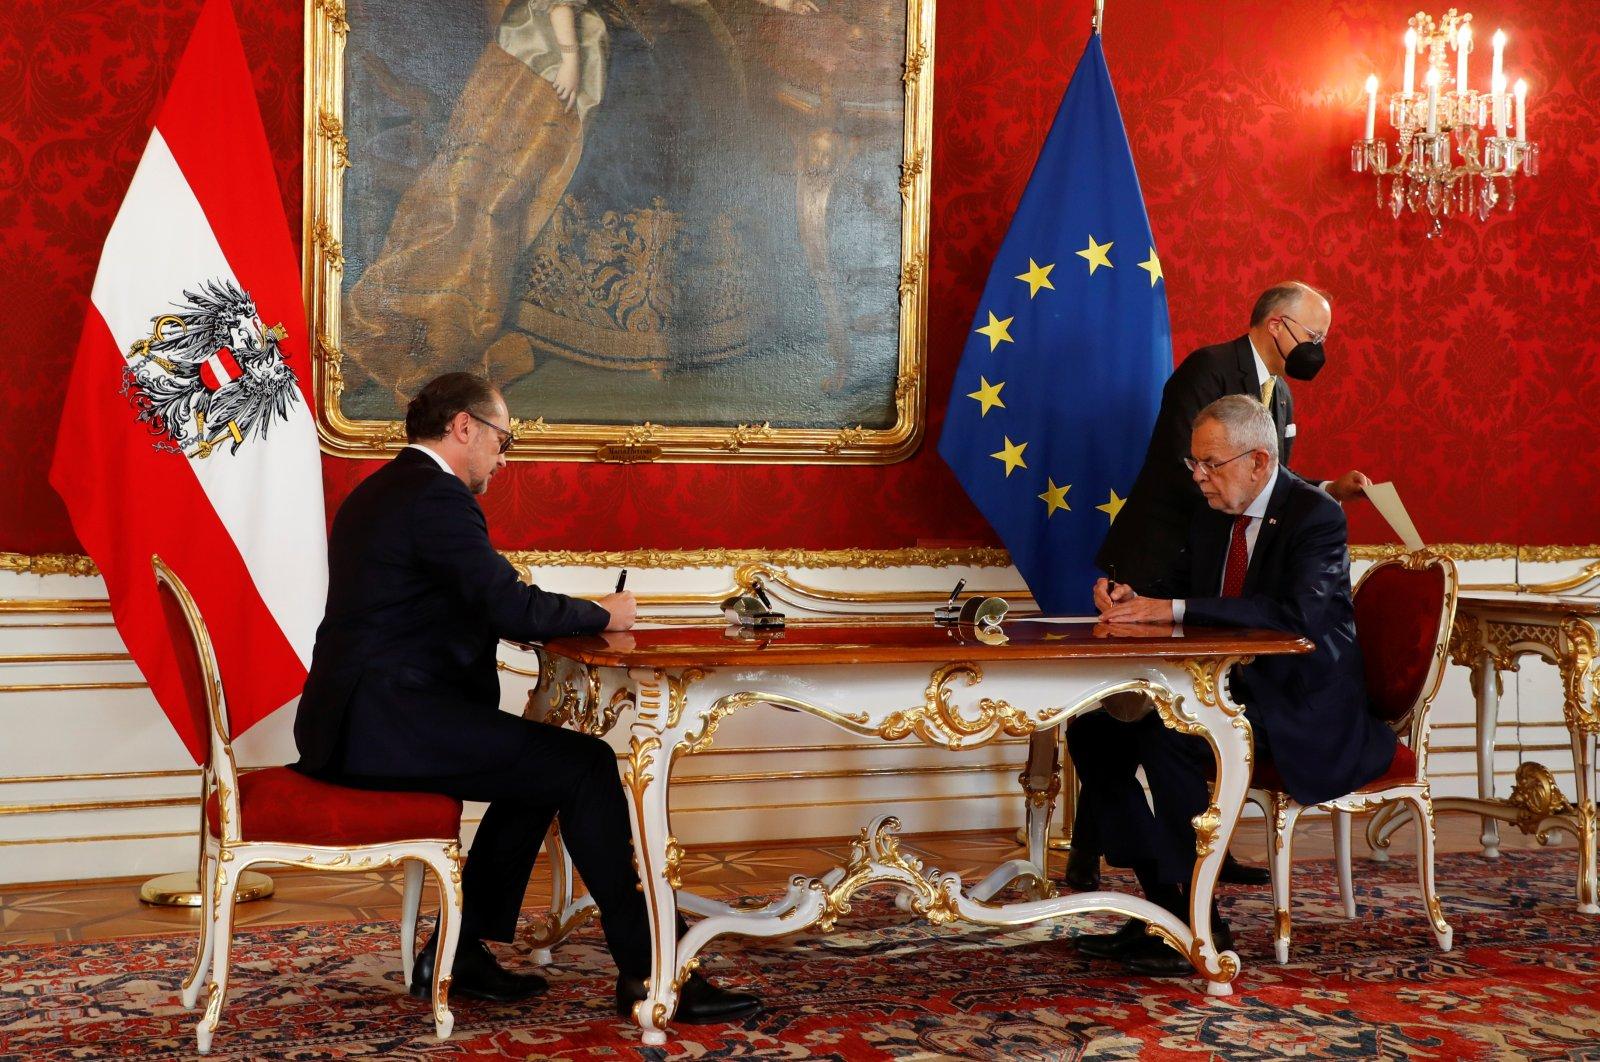 Austria's President Alexander Van der Bellen and new Chancellor of the People's Party (ÖVP) Alexander Schallenberg sign contracts during the swearing-in ceremony in Vienna, Austria, Oct. 11, 2021. (Reuters Photo)